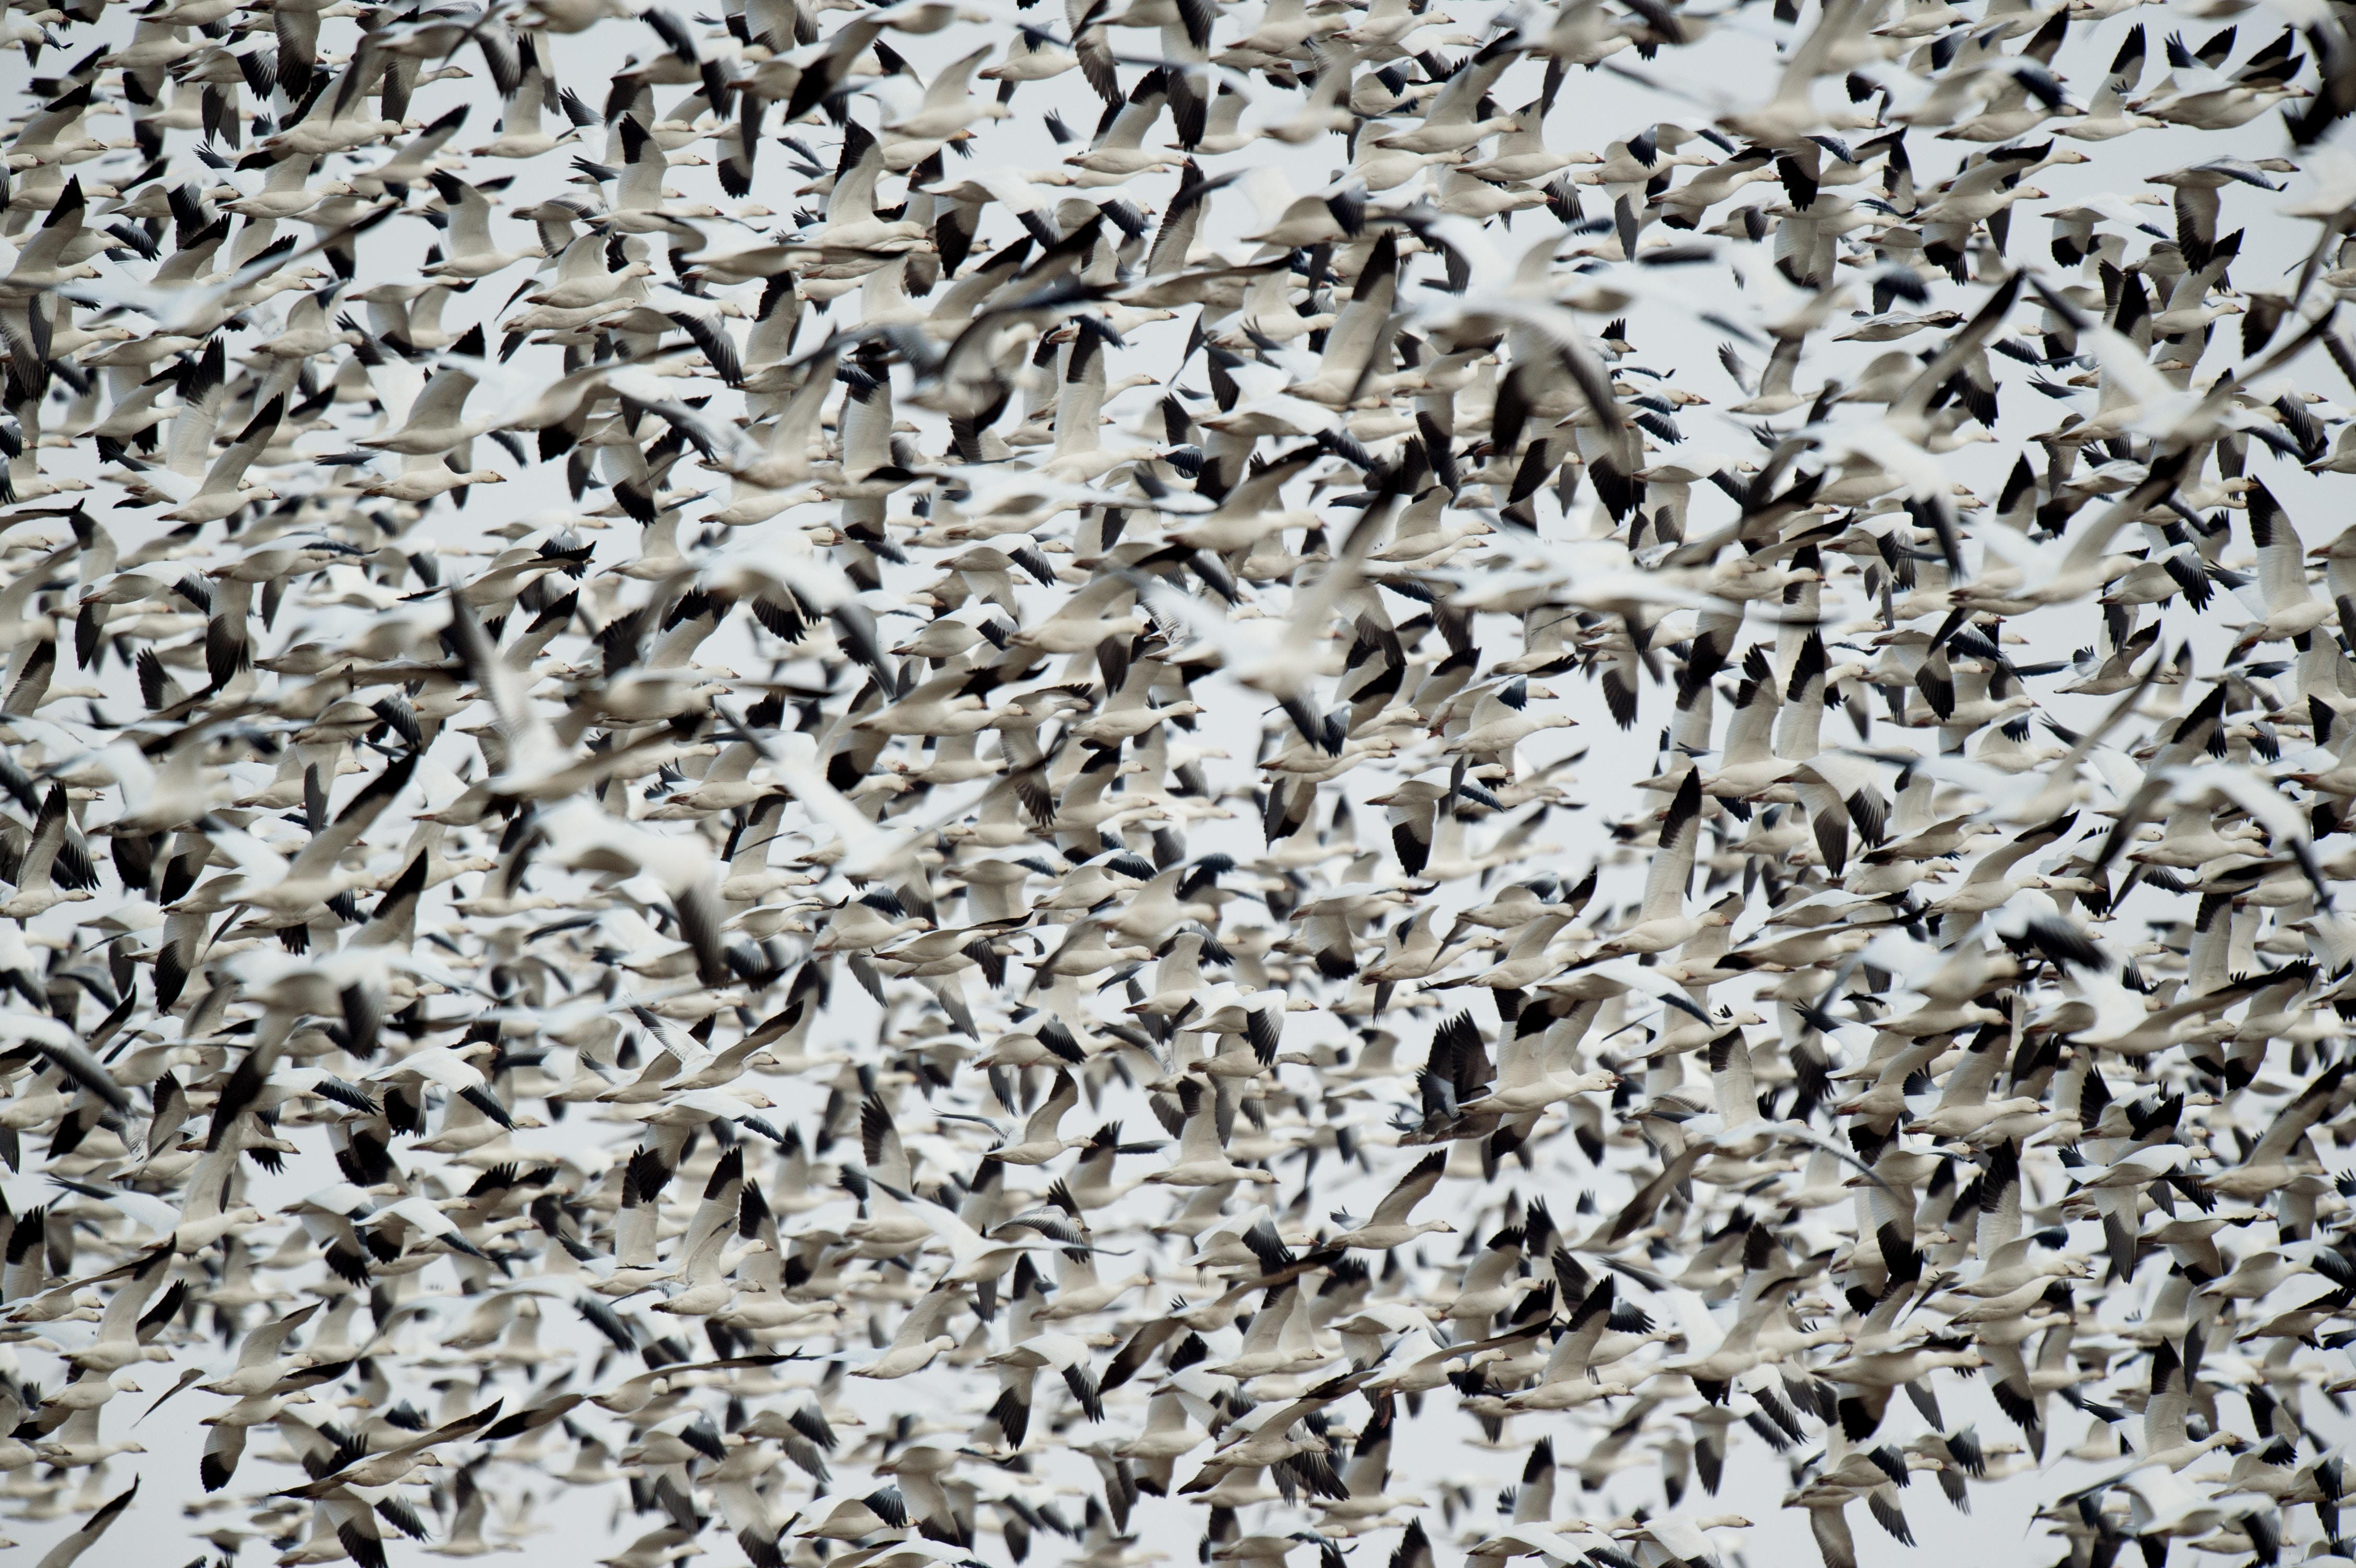 flock of white-and-black birds